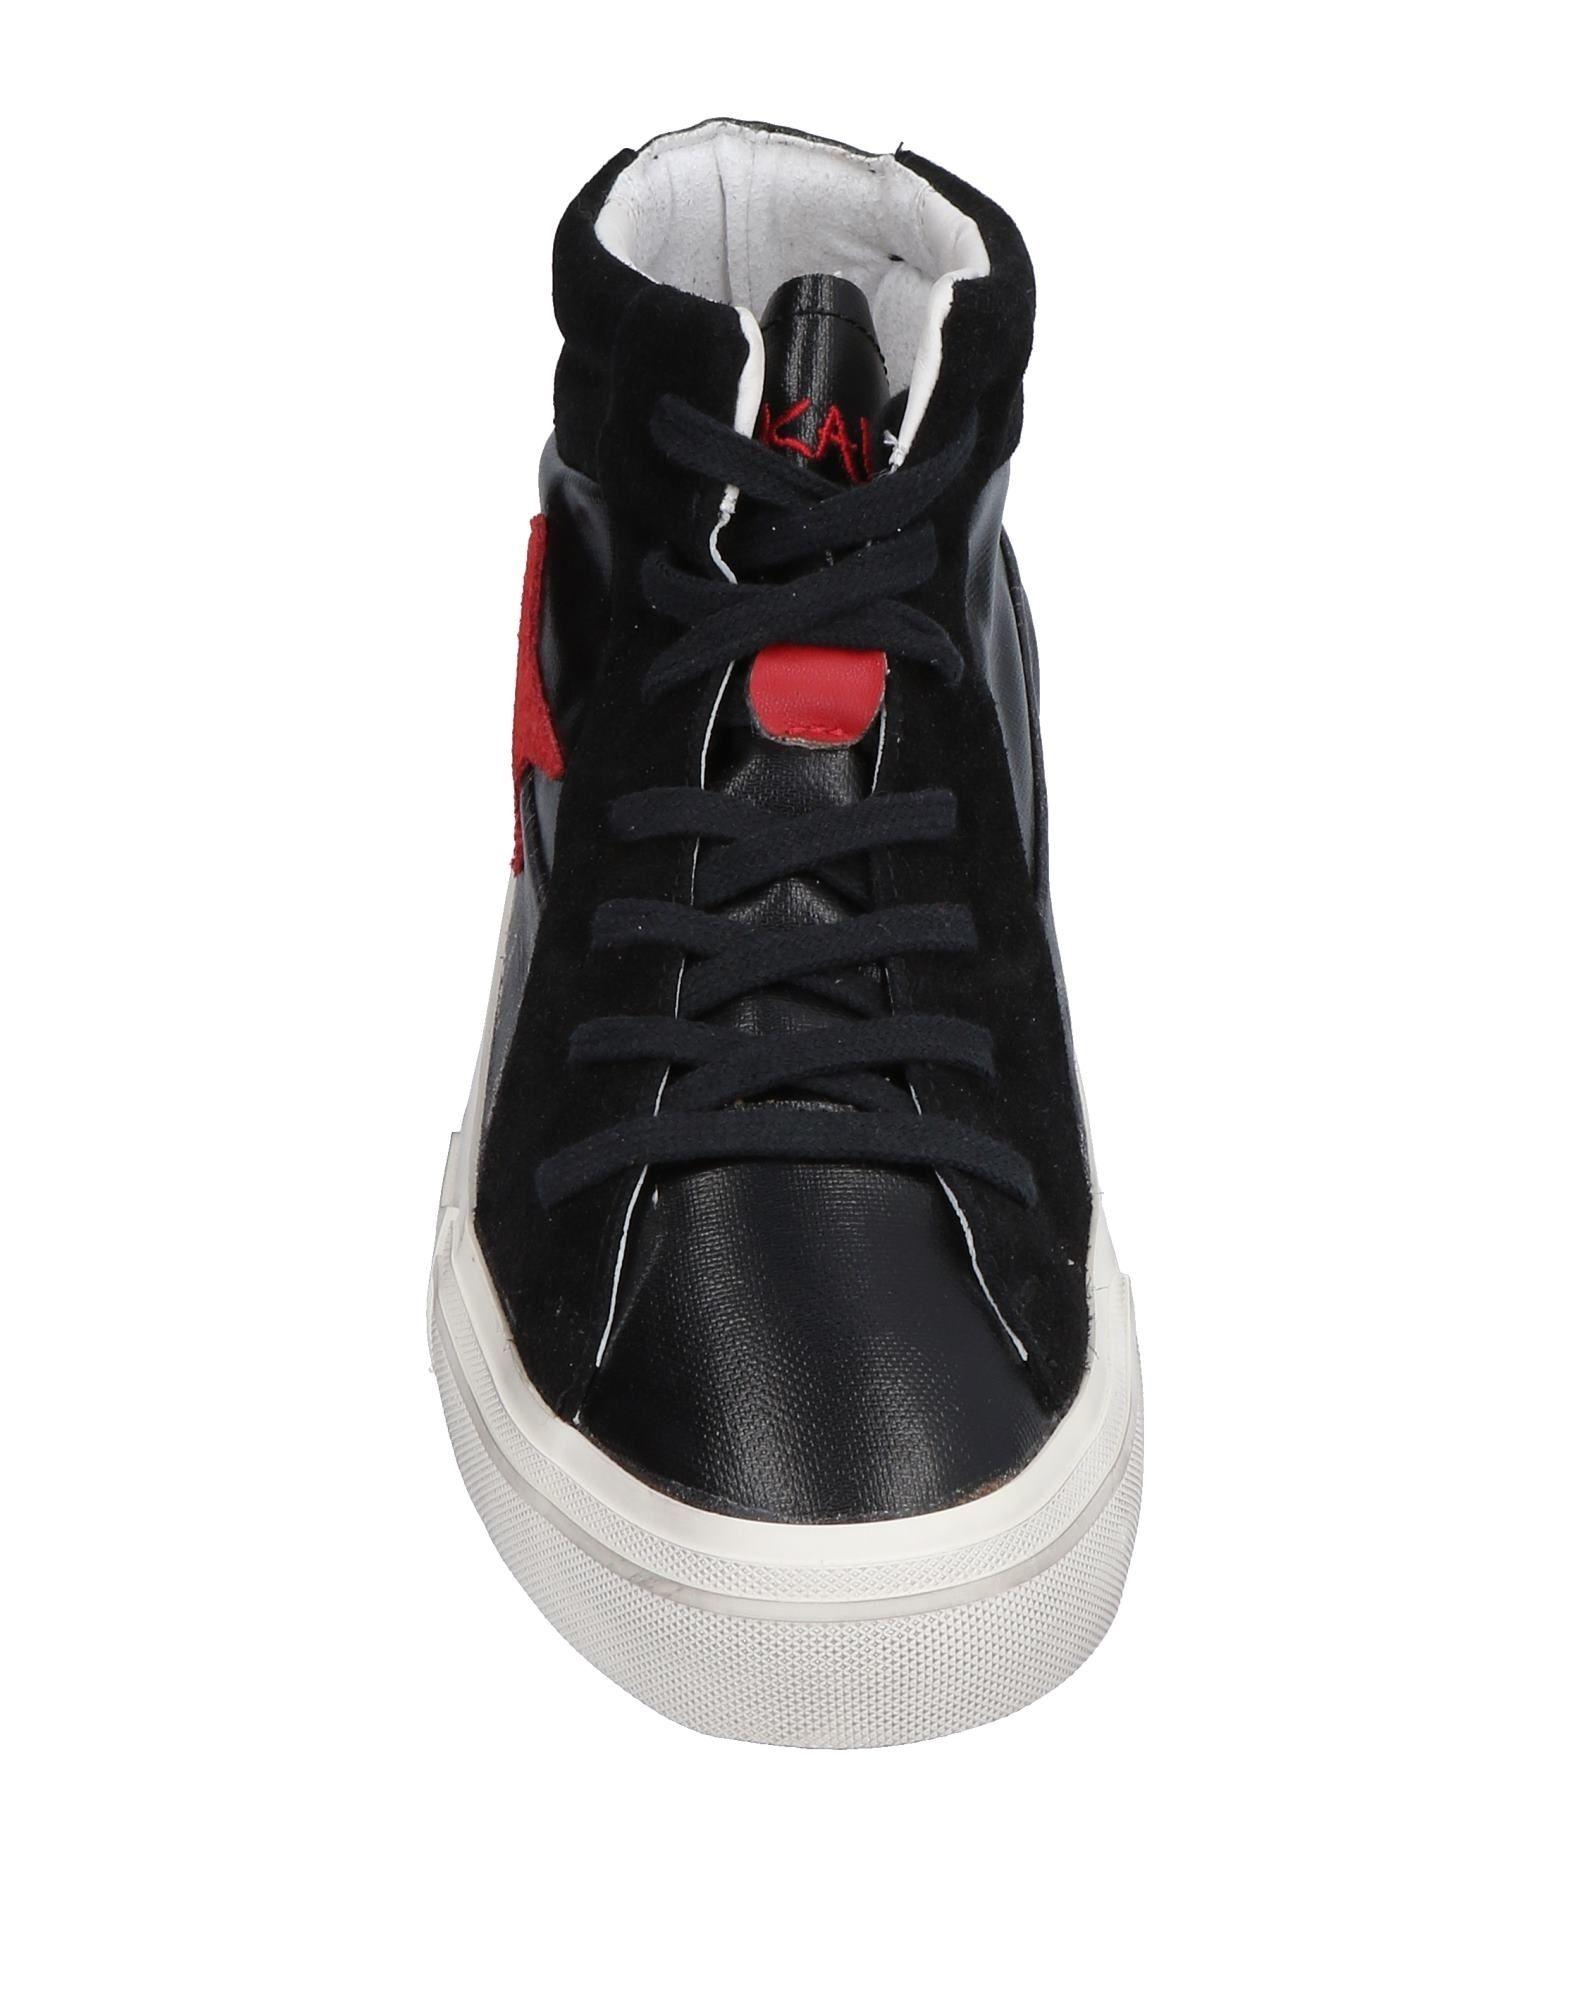 11520410WJ Ishikawa Sneakers Herren  11520410WJ  7a36c8